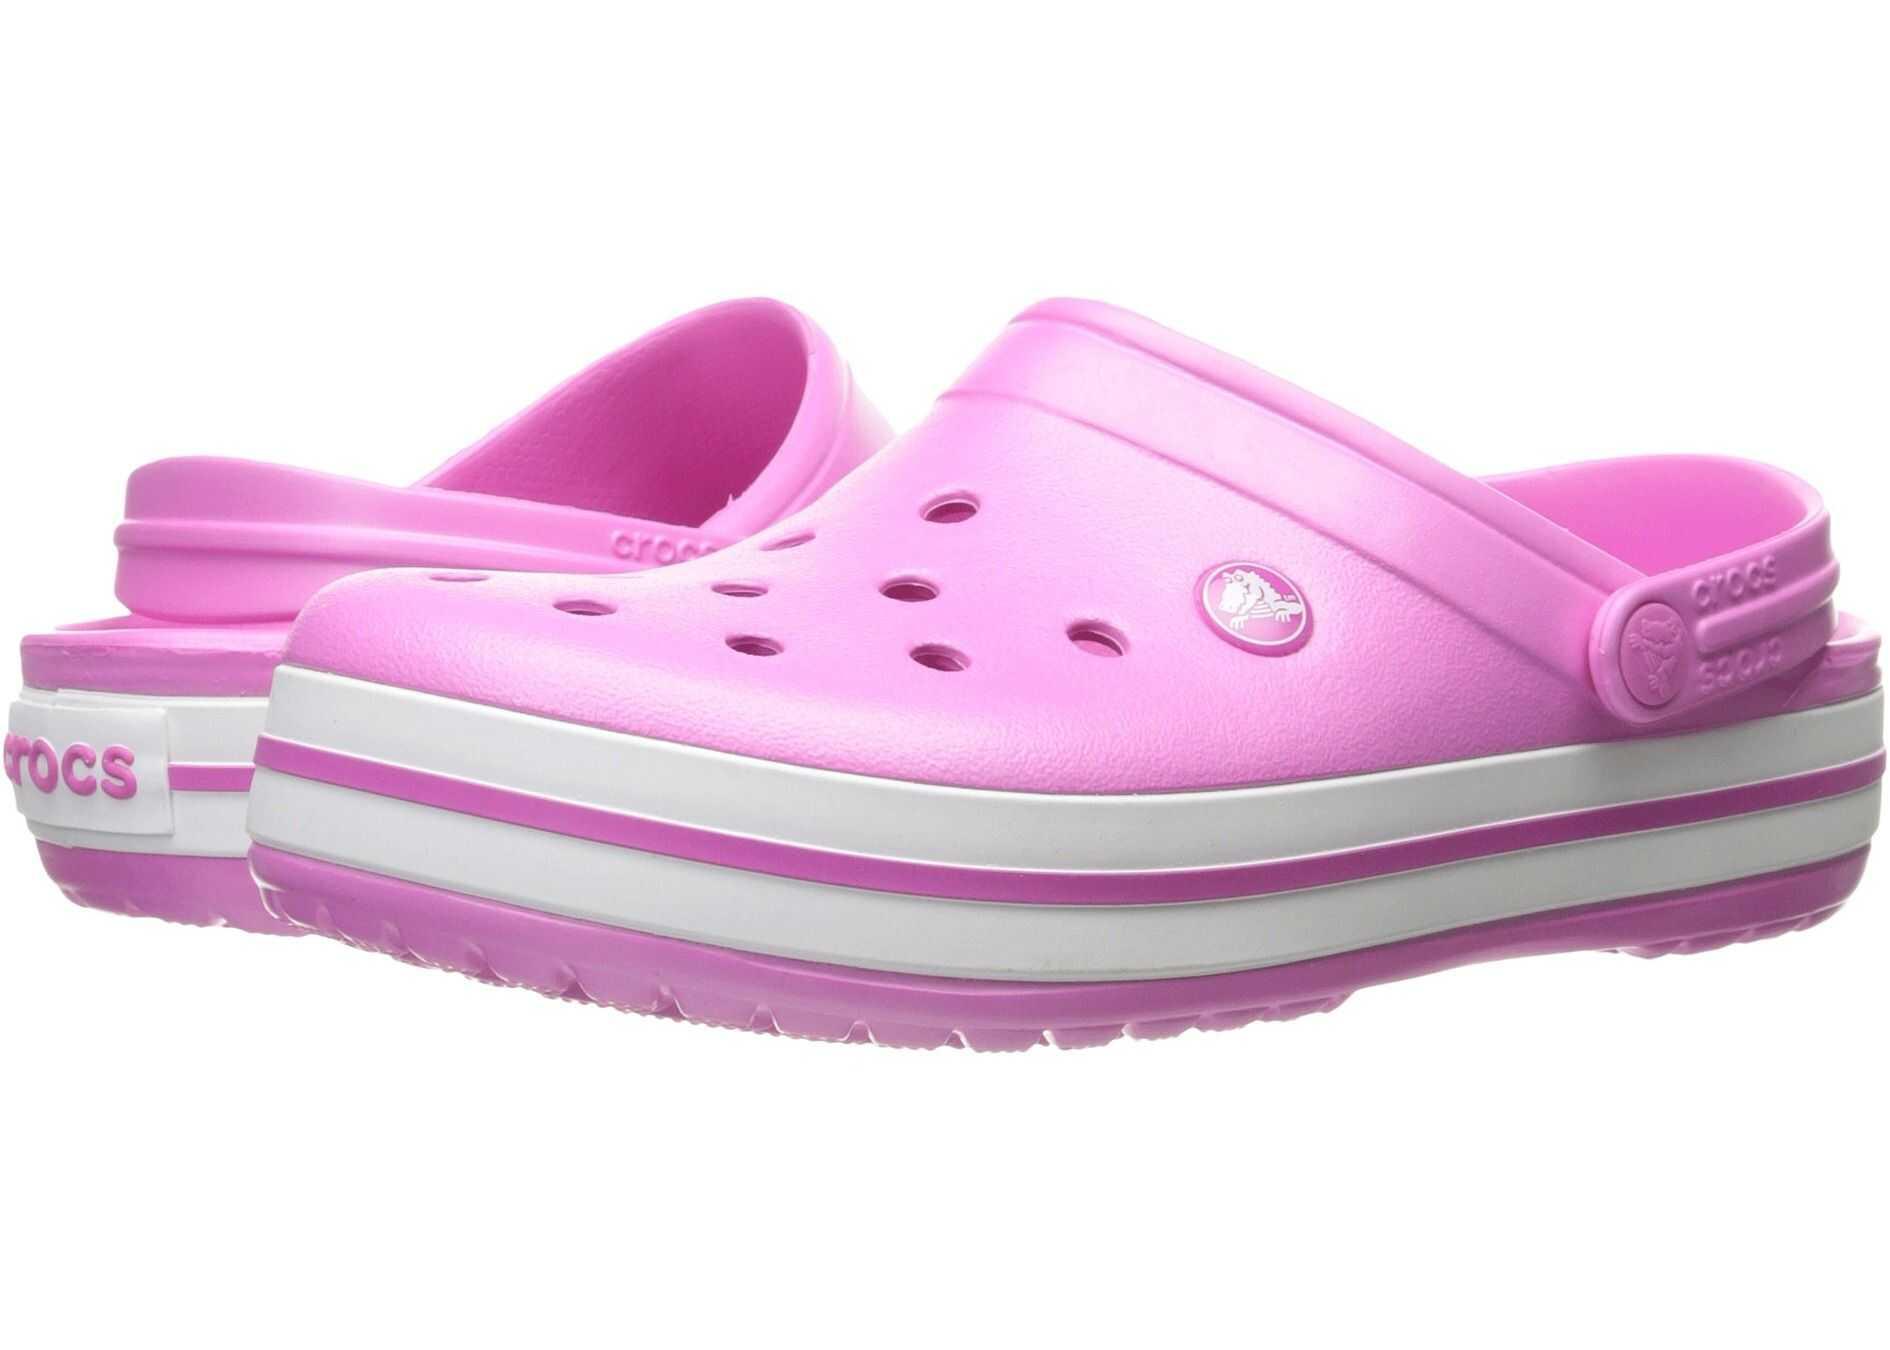 Crocs Crocband Clog Party Pink